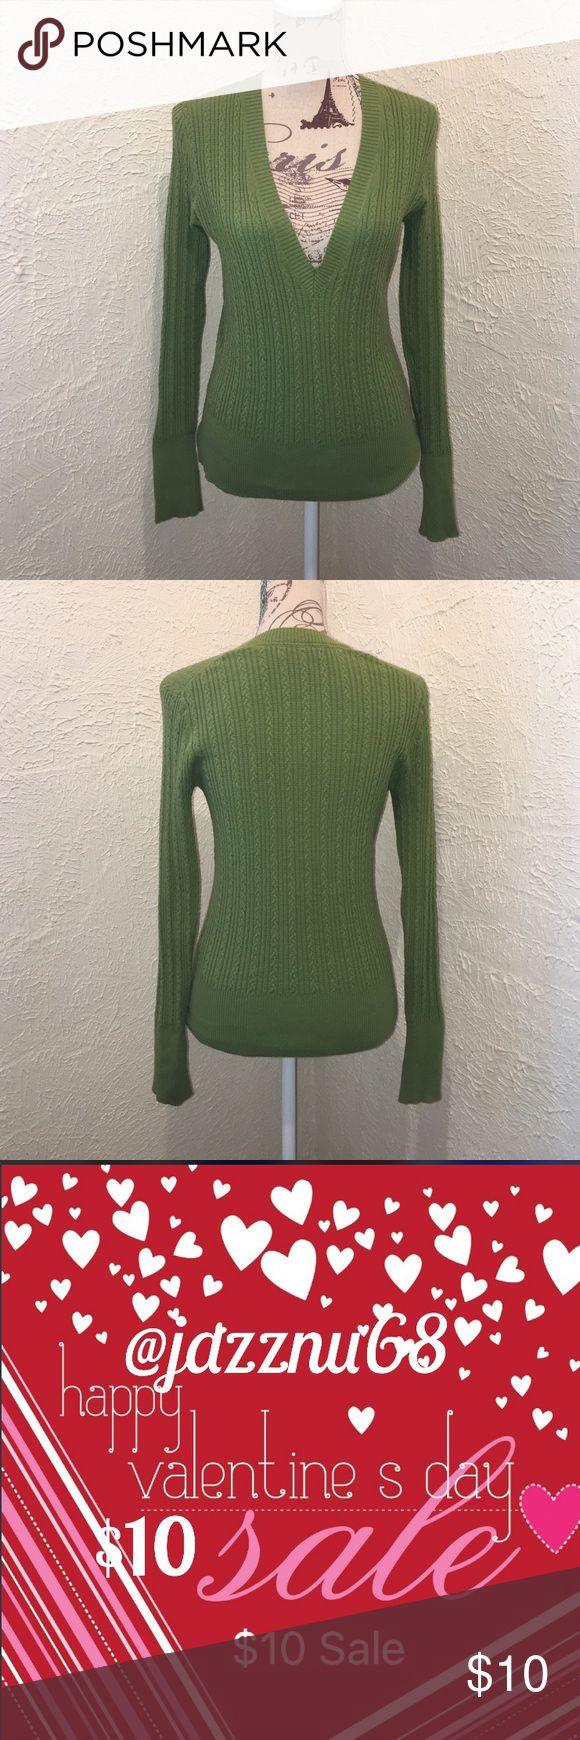 💋🌹Express•Green• V-Neck •Sweater Express•Green• V-Neck •Sweater Express Sweaters V-Necks